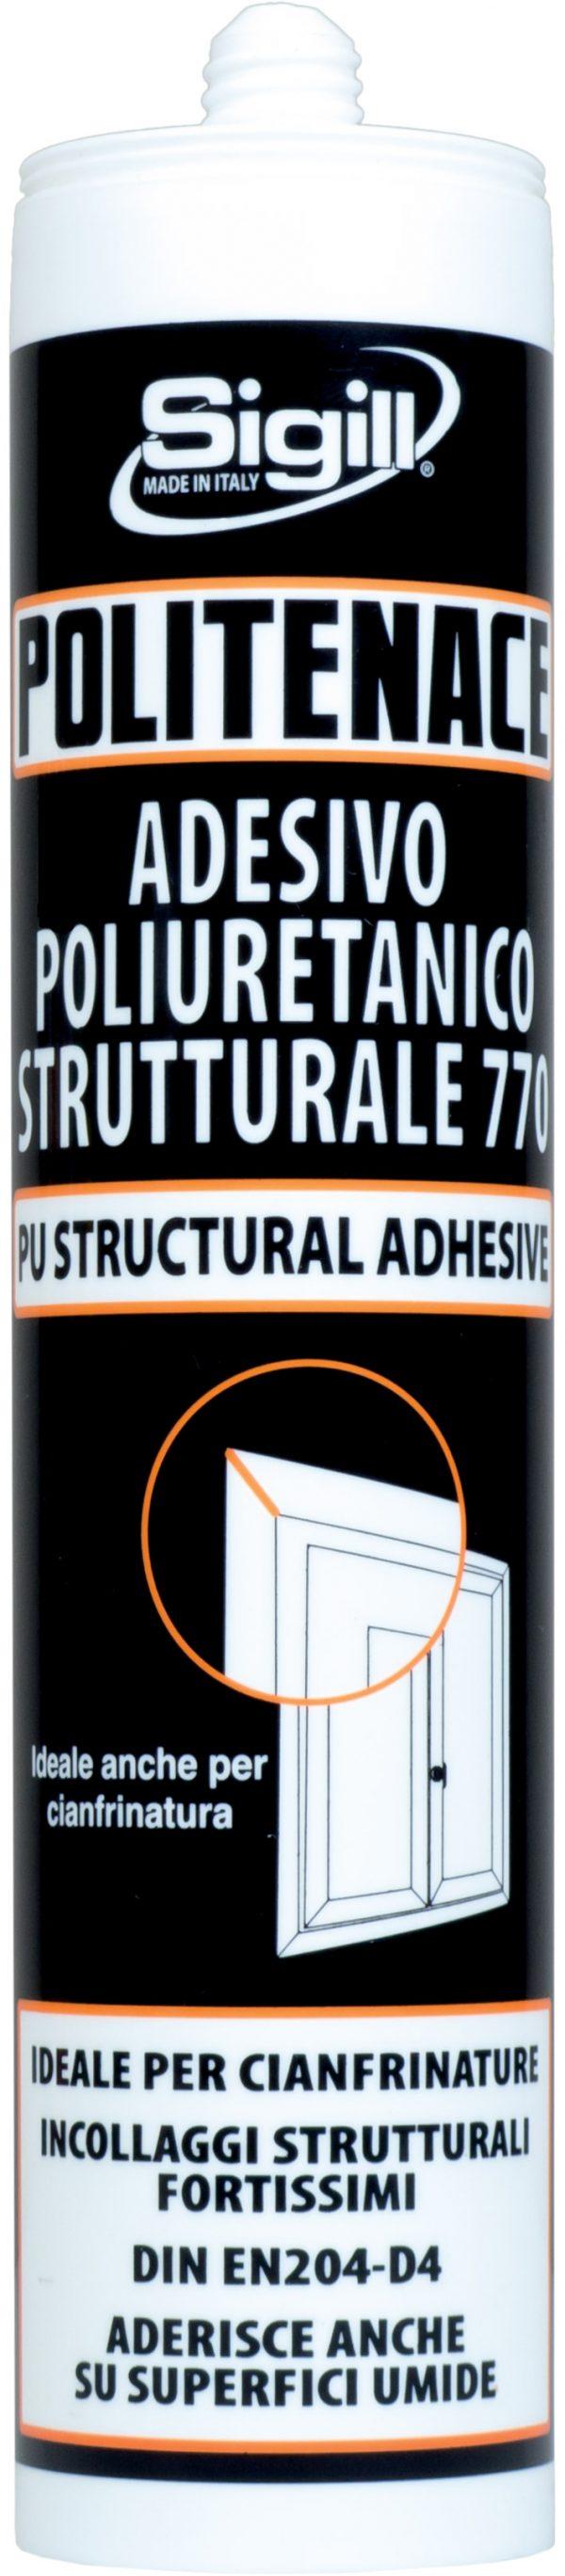 adesivo poliuretanico strutturale, colla poliuretanica